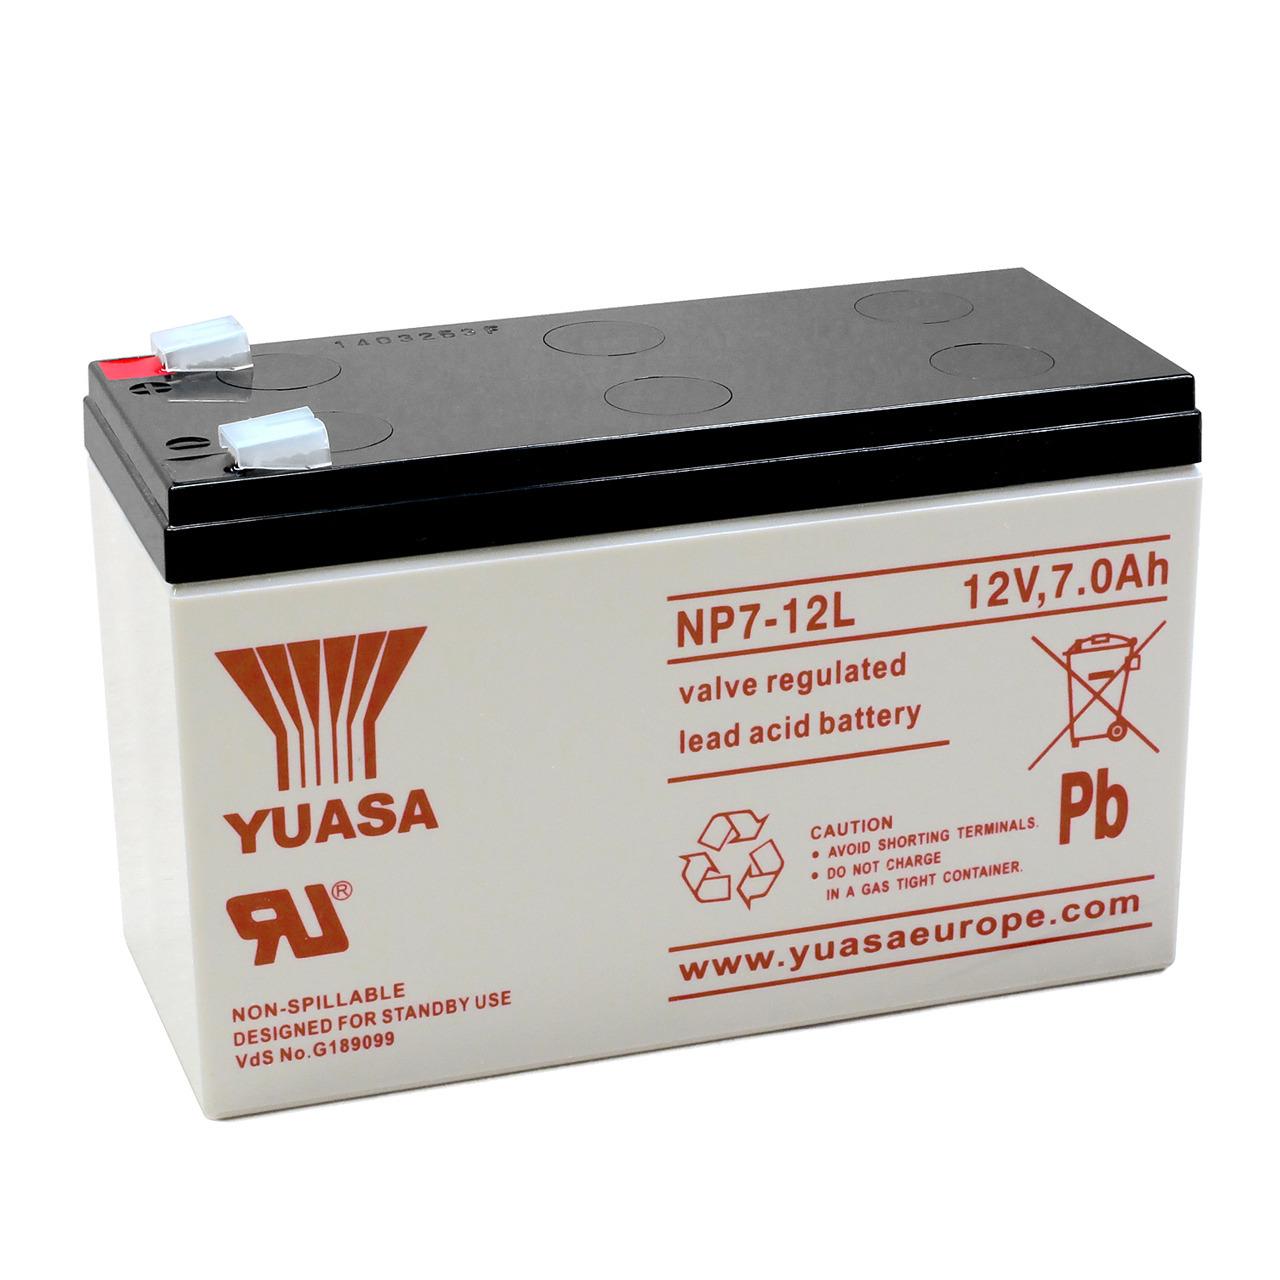 yuasa AGM Bleiakku NP7-12L mit VdS- Fastonkontakt 6-3mm- 12 V - 7 Ah